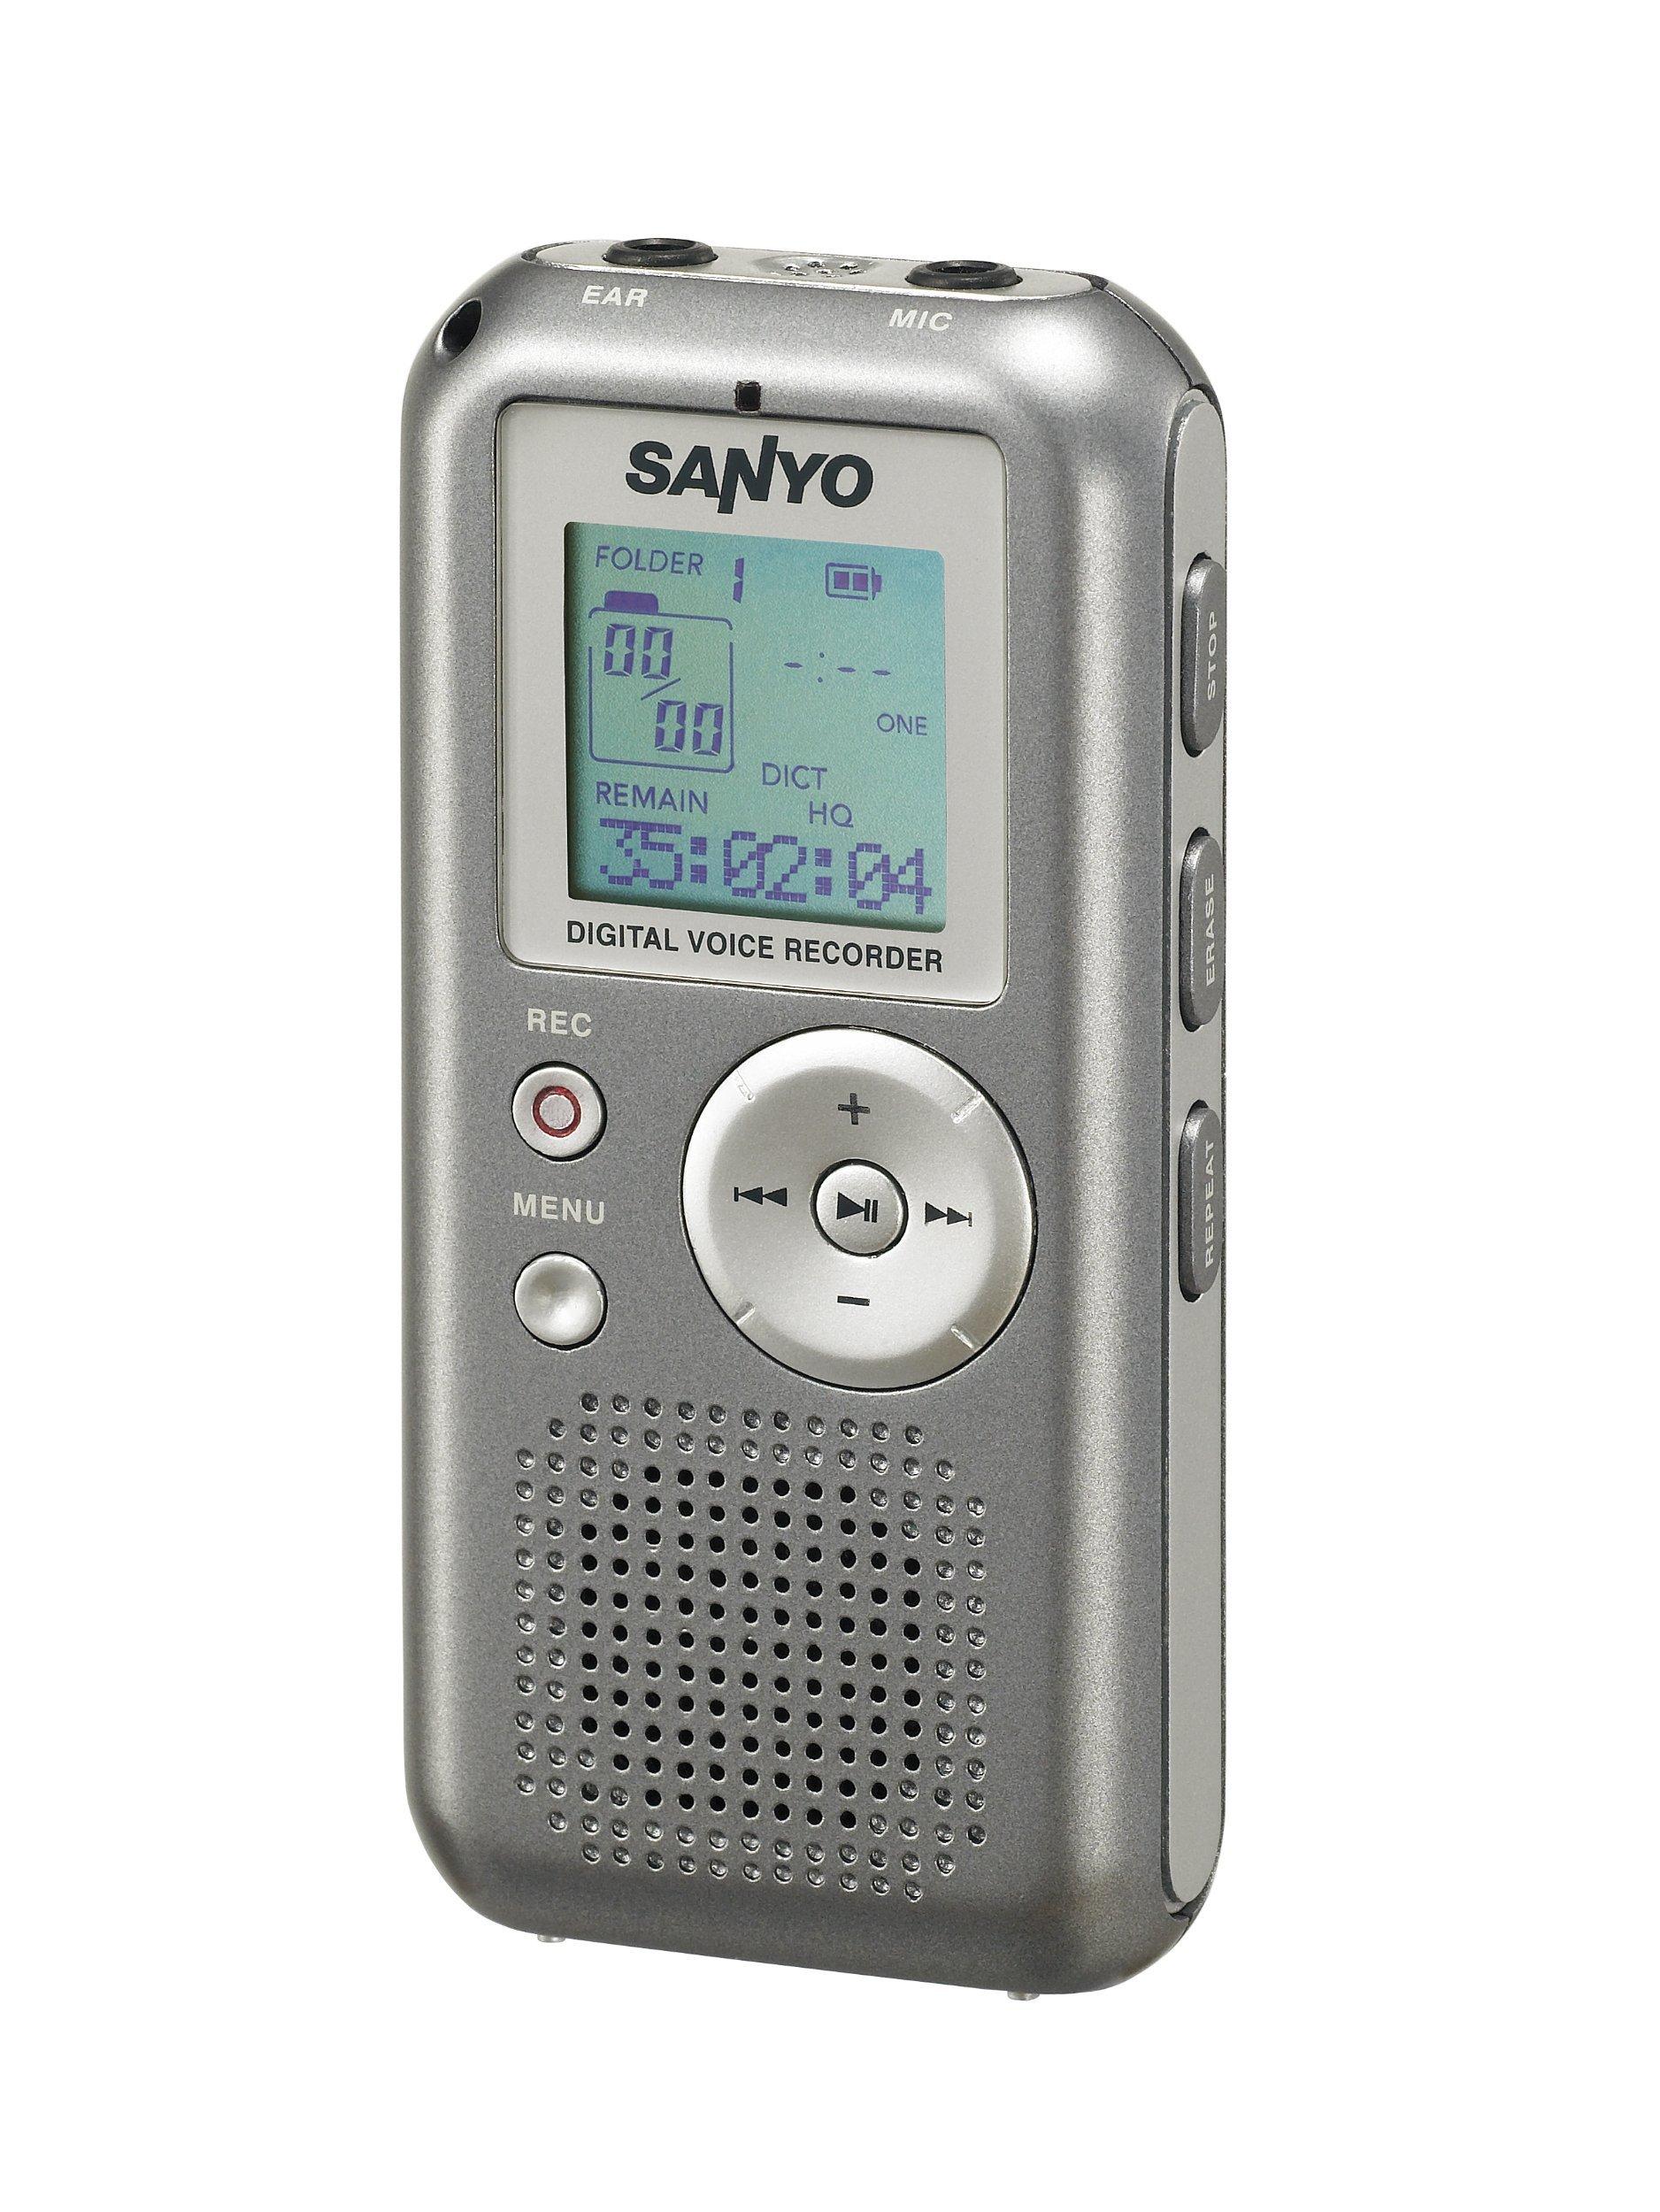 Sanyo Sanyo Digital Voice Recorder Built-In Memory 1Gb